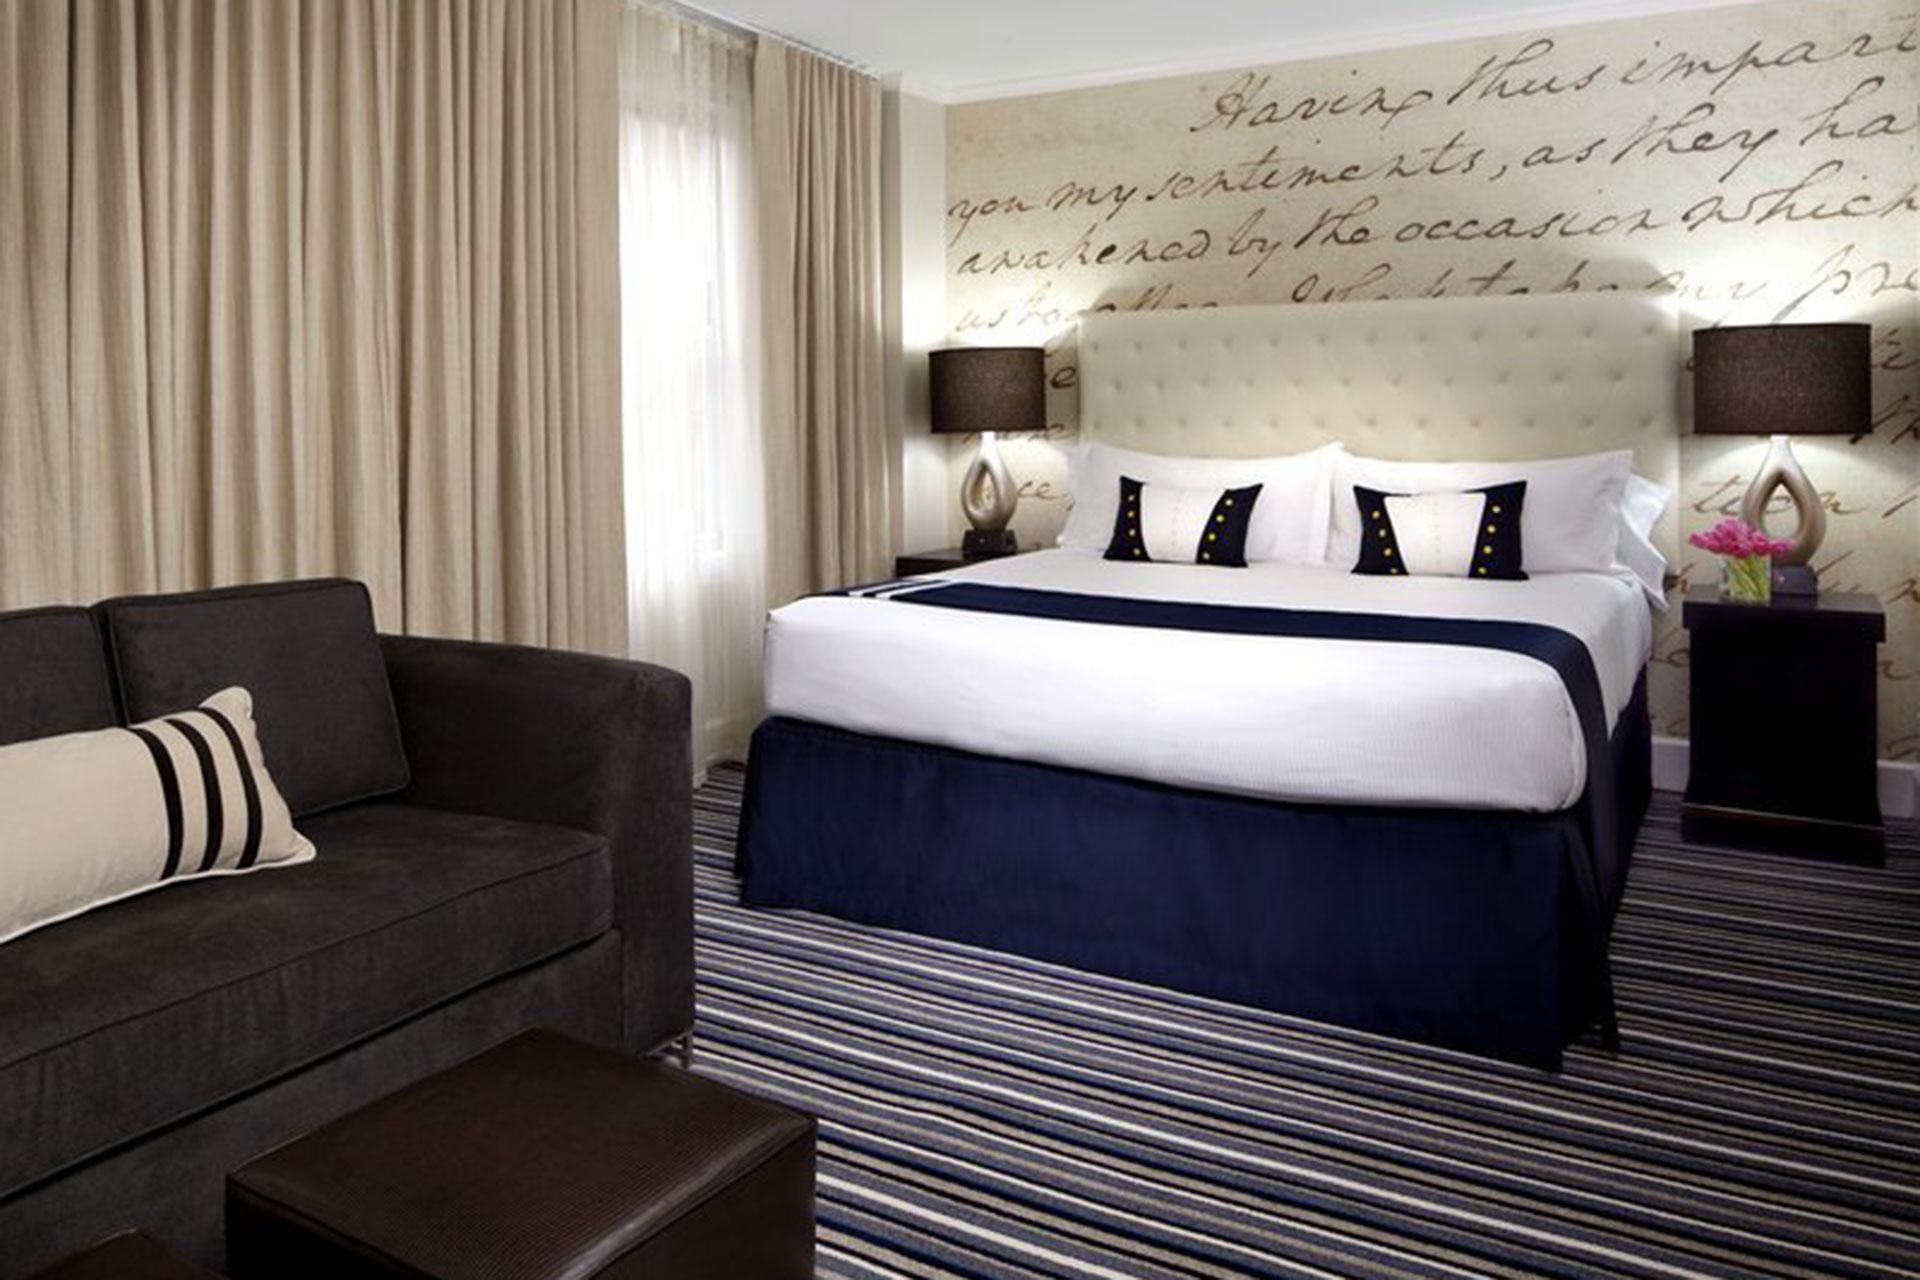 Hotel George in Washington D.C.